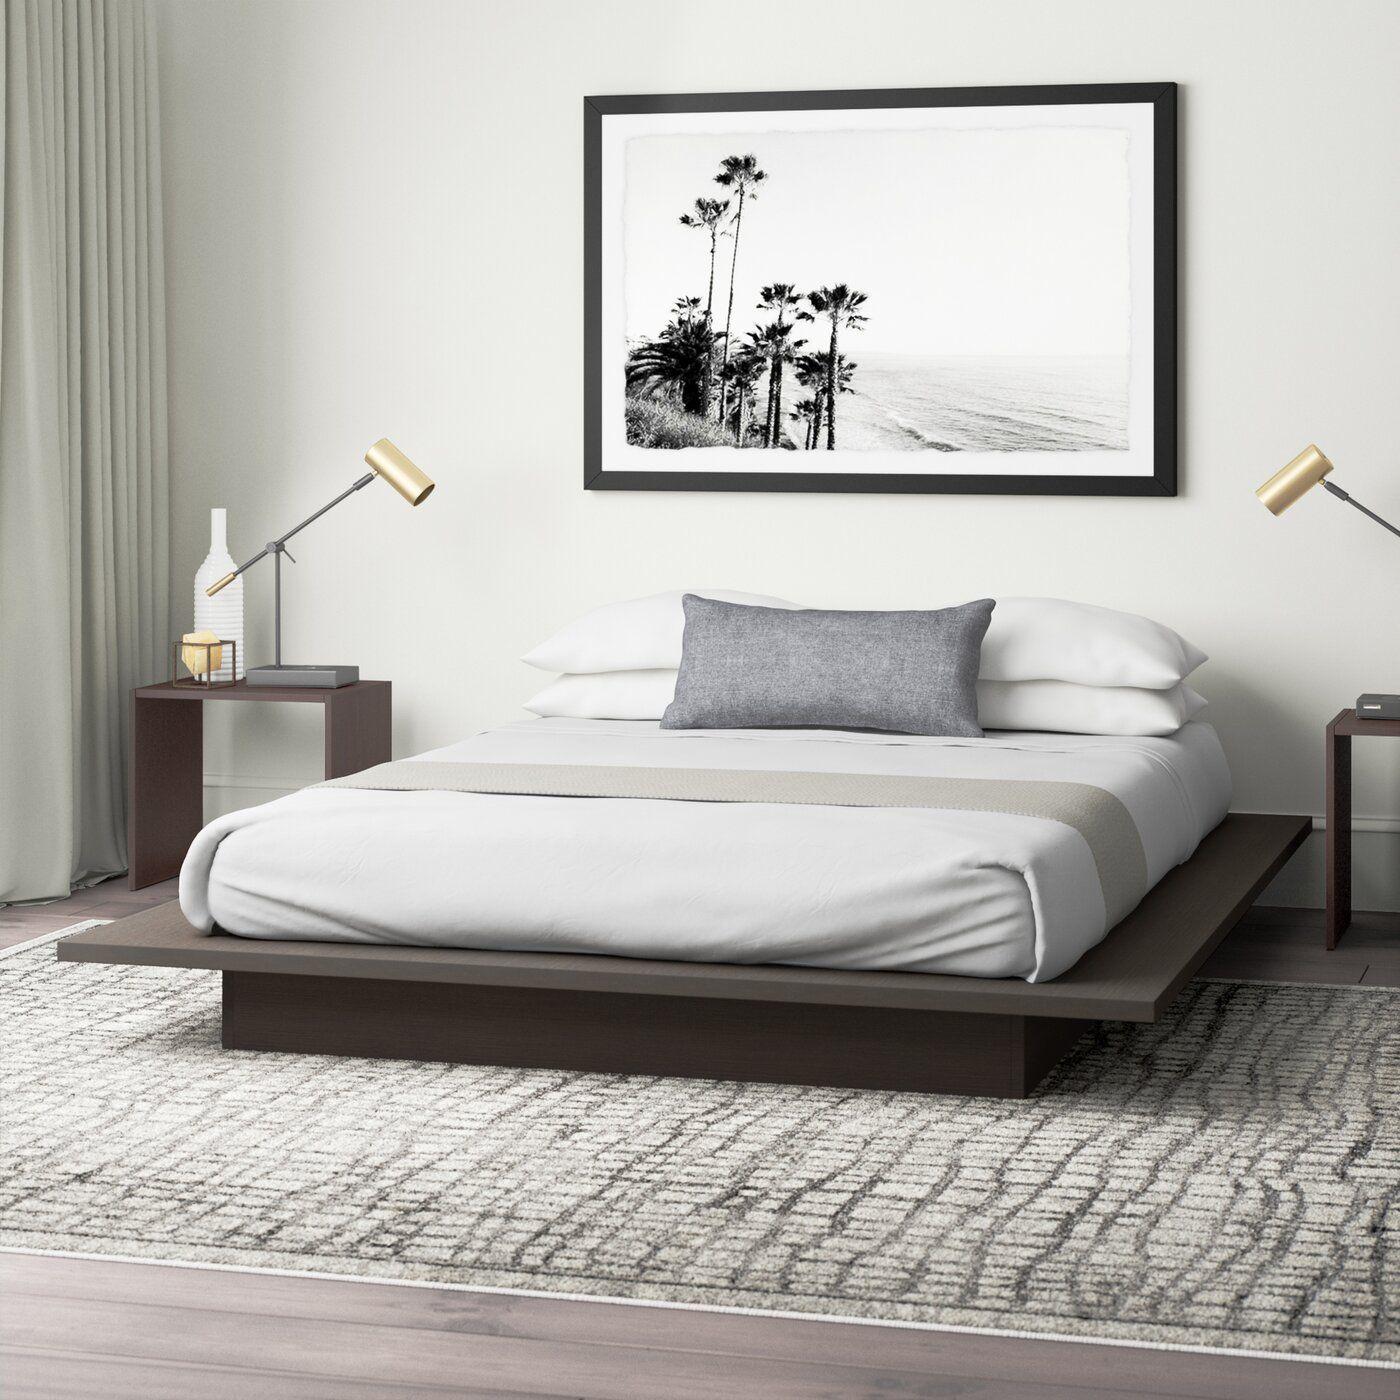 Pin on Modern Bedroom